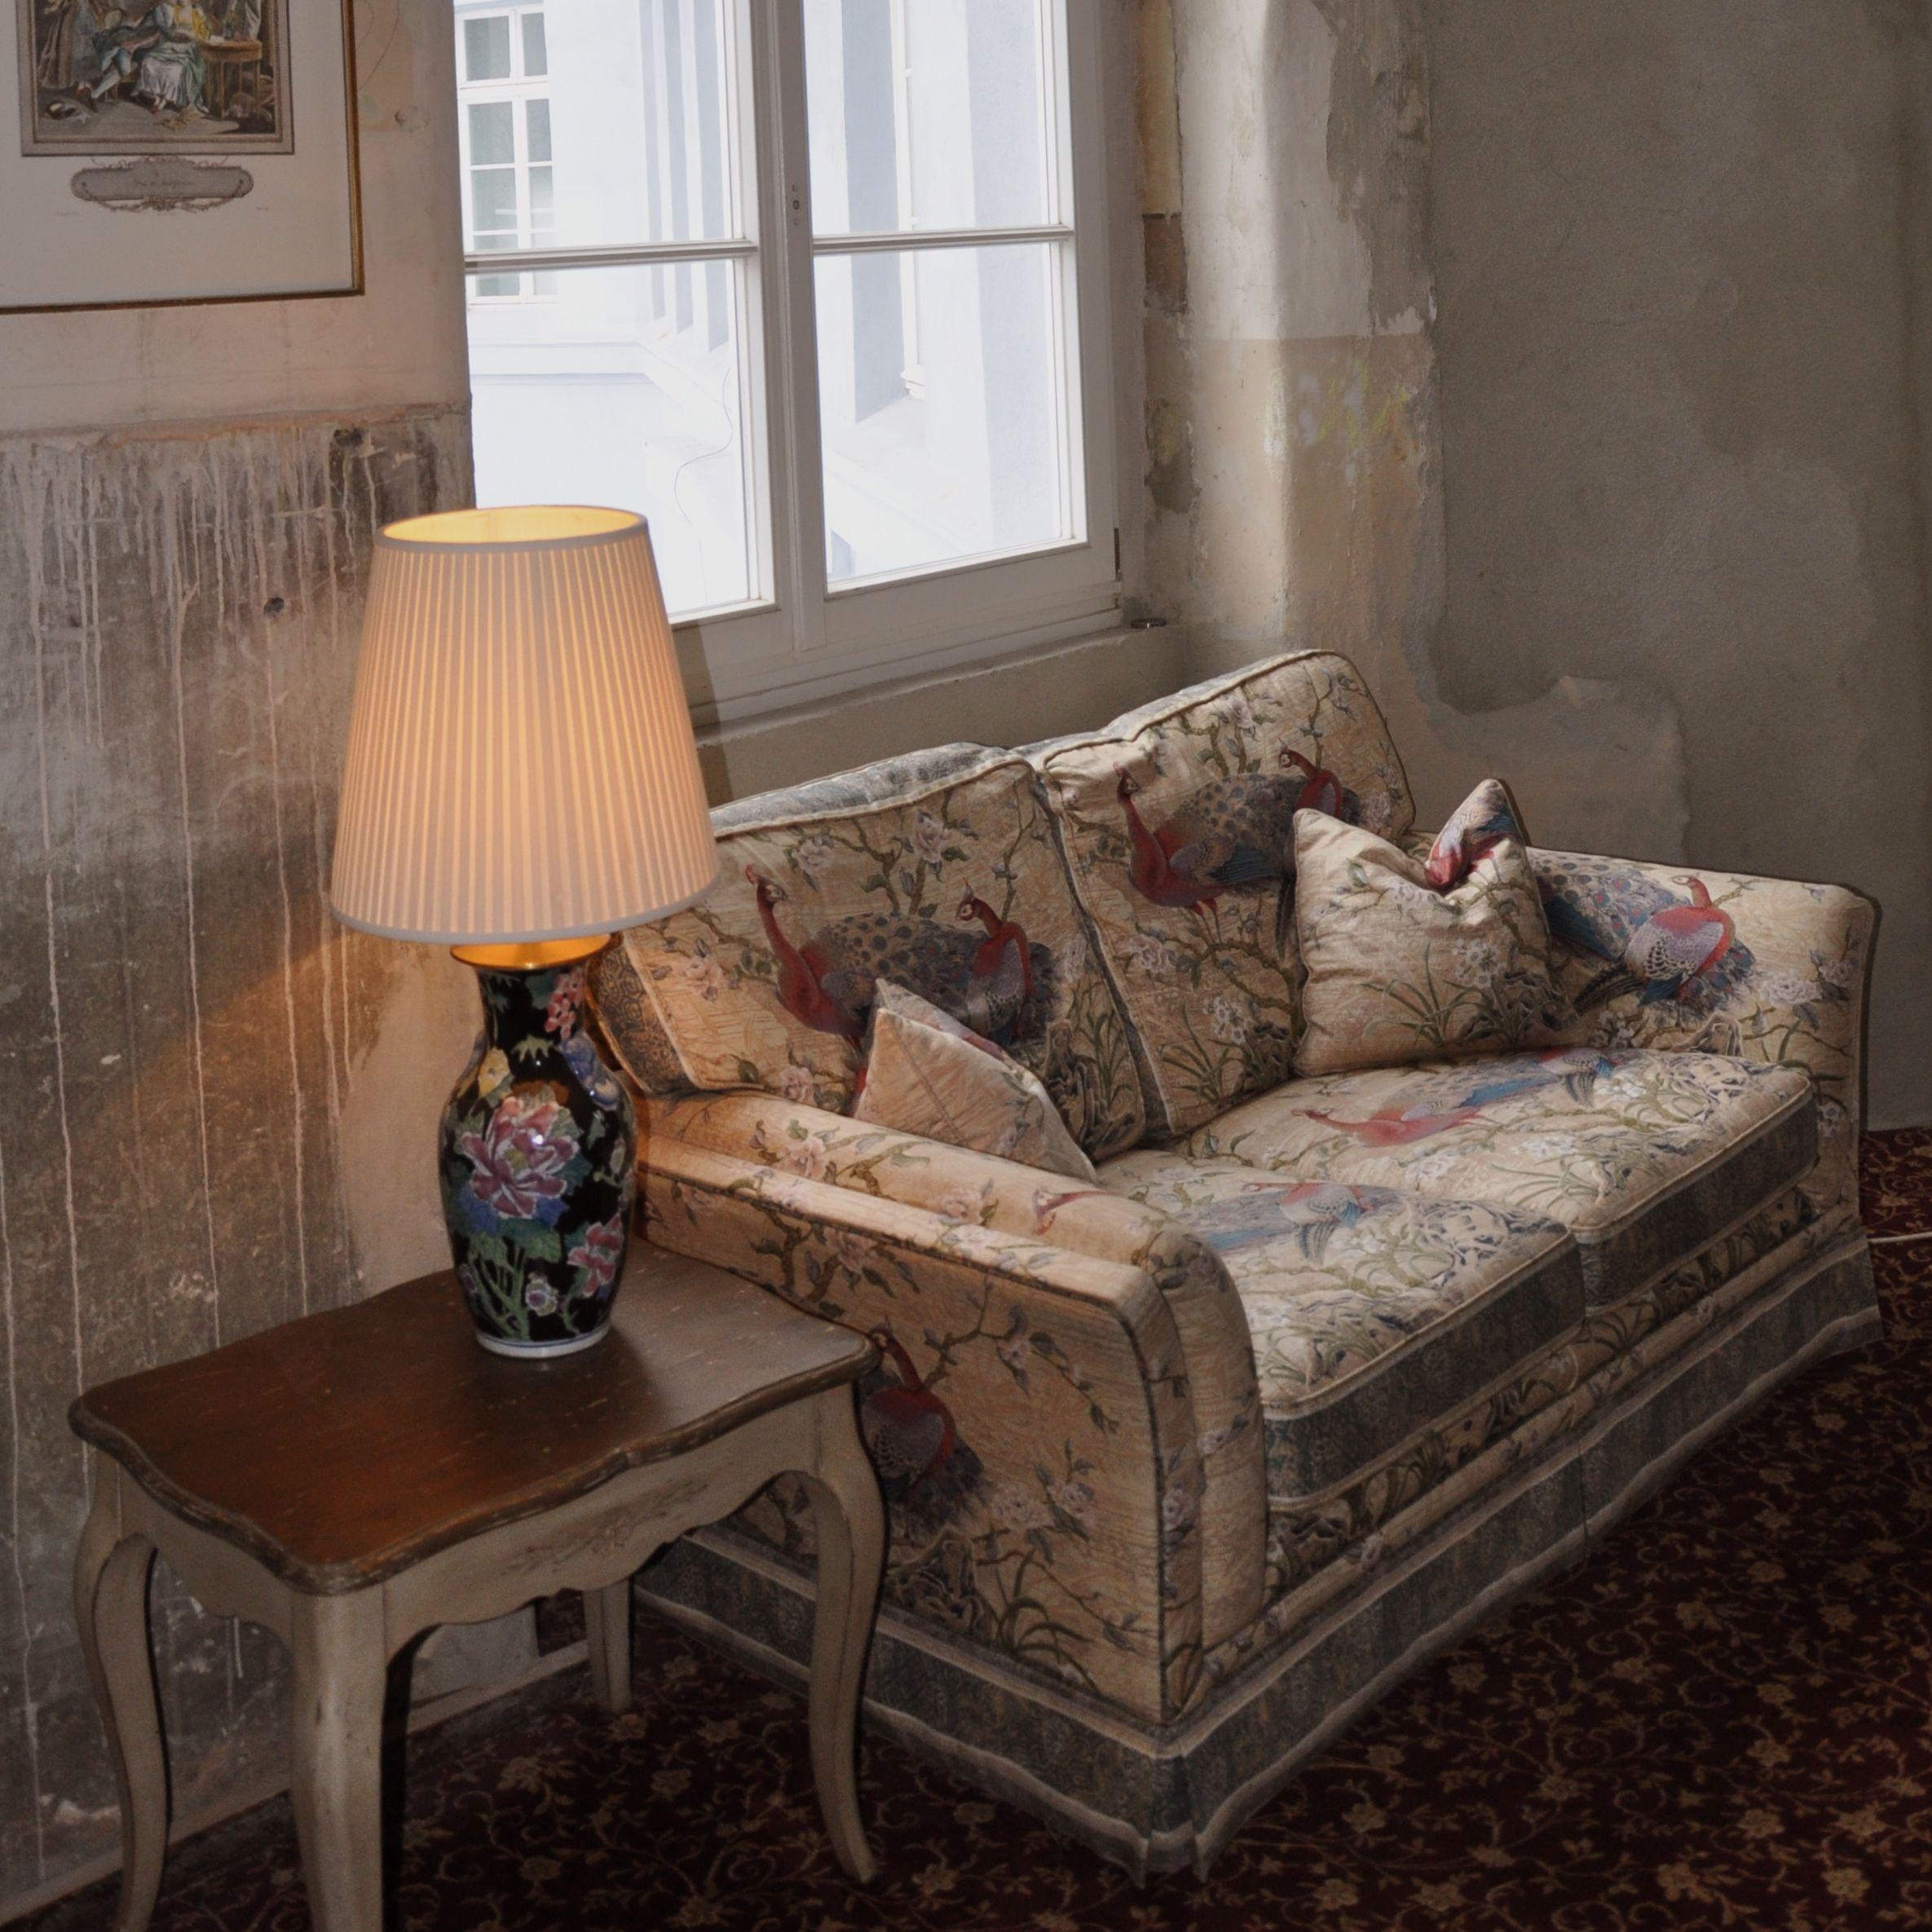 The-Grand-Berlin-Sofa